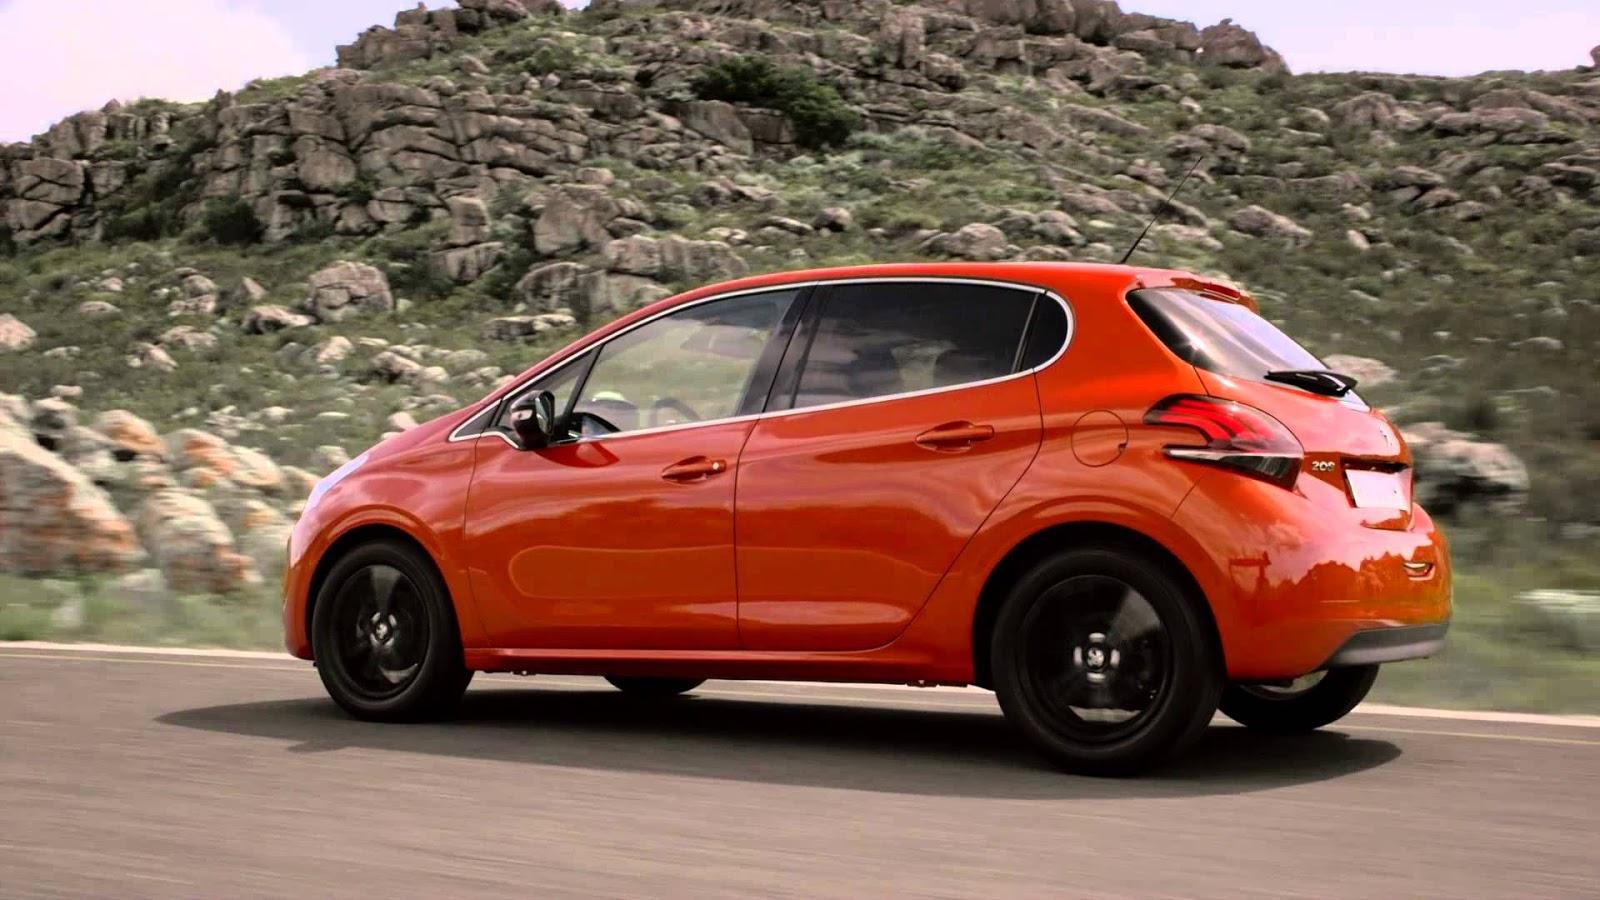 f1 2 Ρίχνουμε στην κίνηση της Αθήνας το Peugeot 208 1,2 Peugeot, Peugeot 208, TEST, zblog, ΔΟΚΙΜΕΣ, οδηγούμε